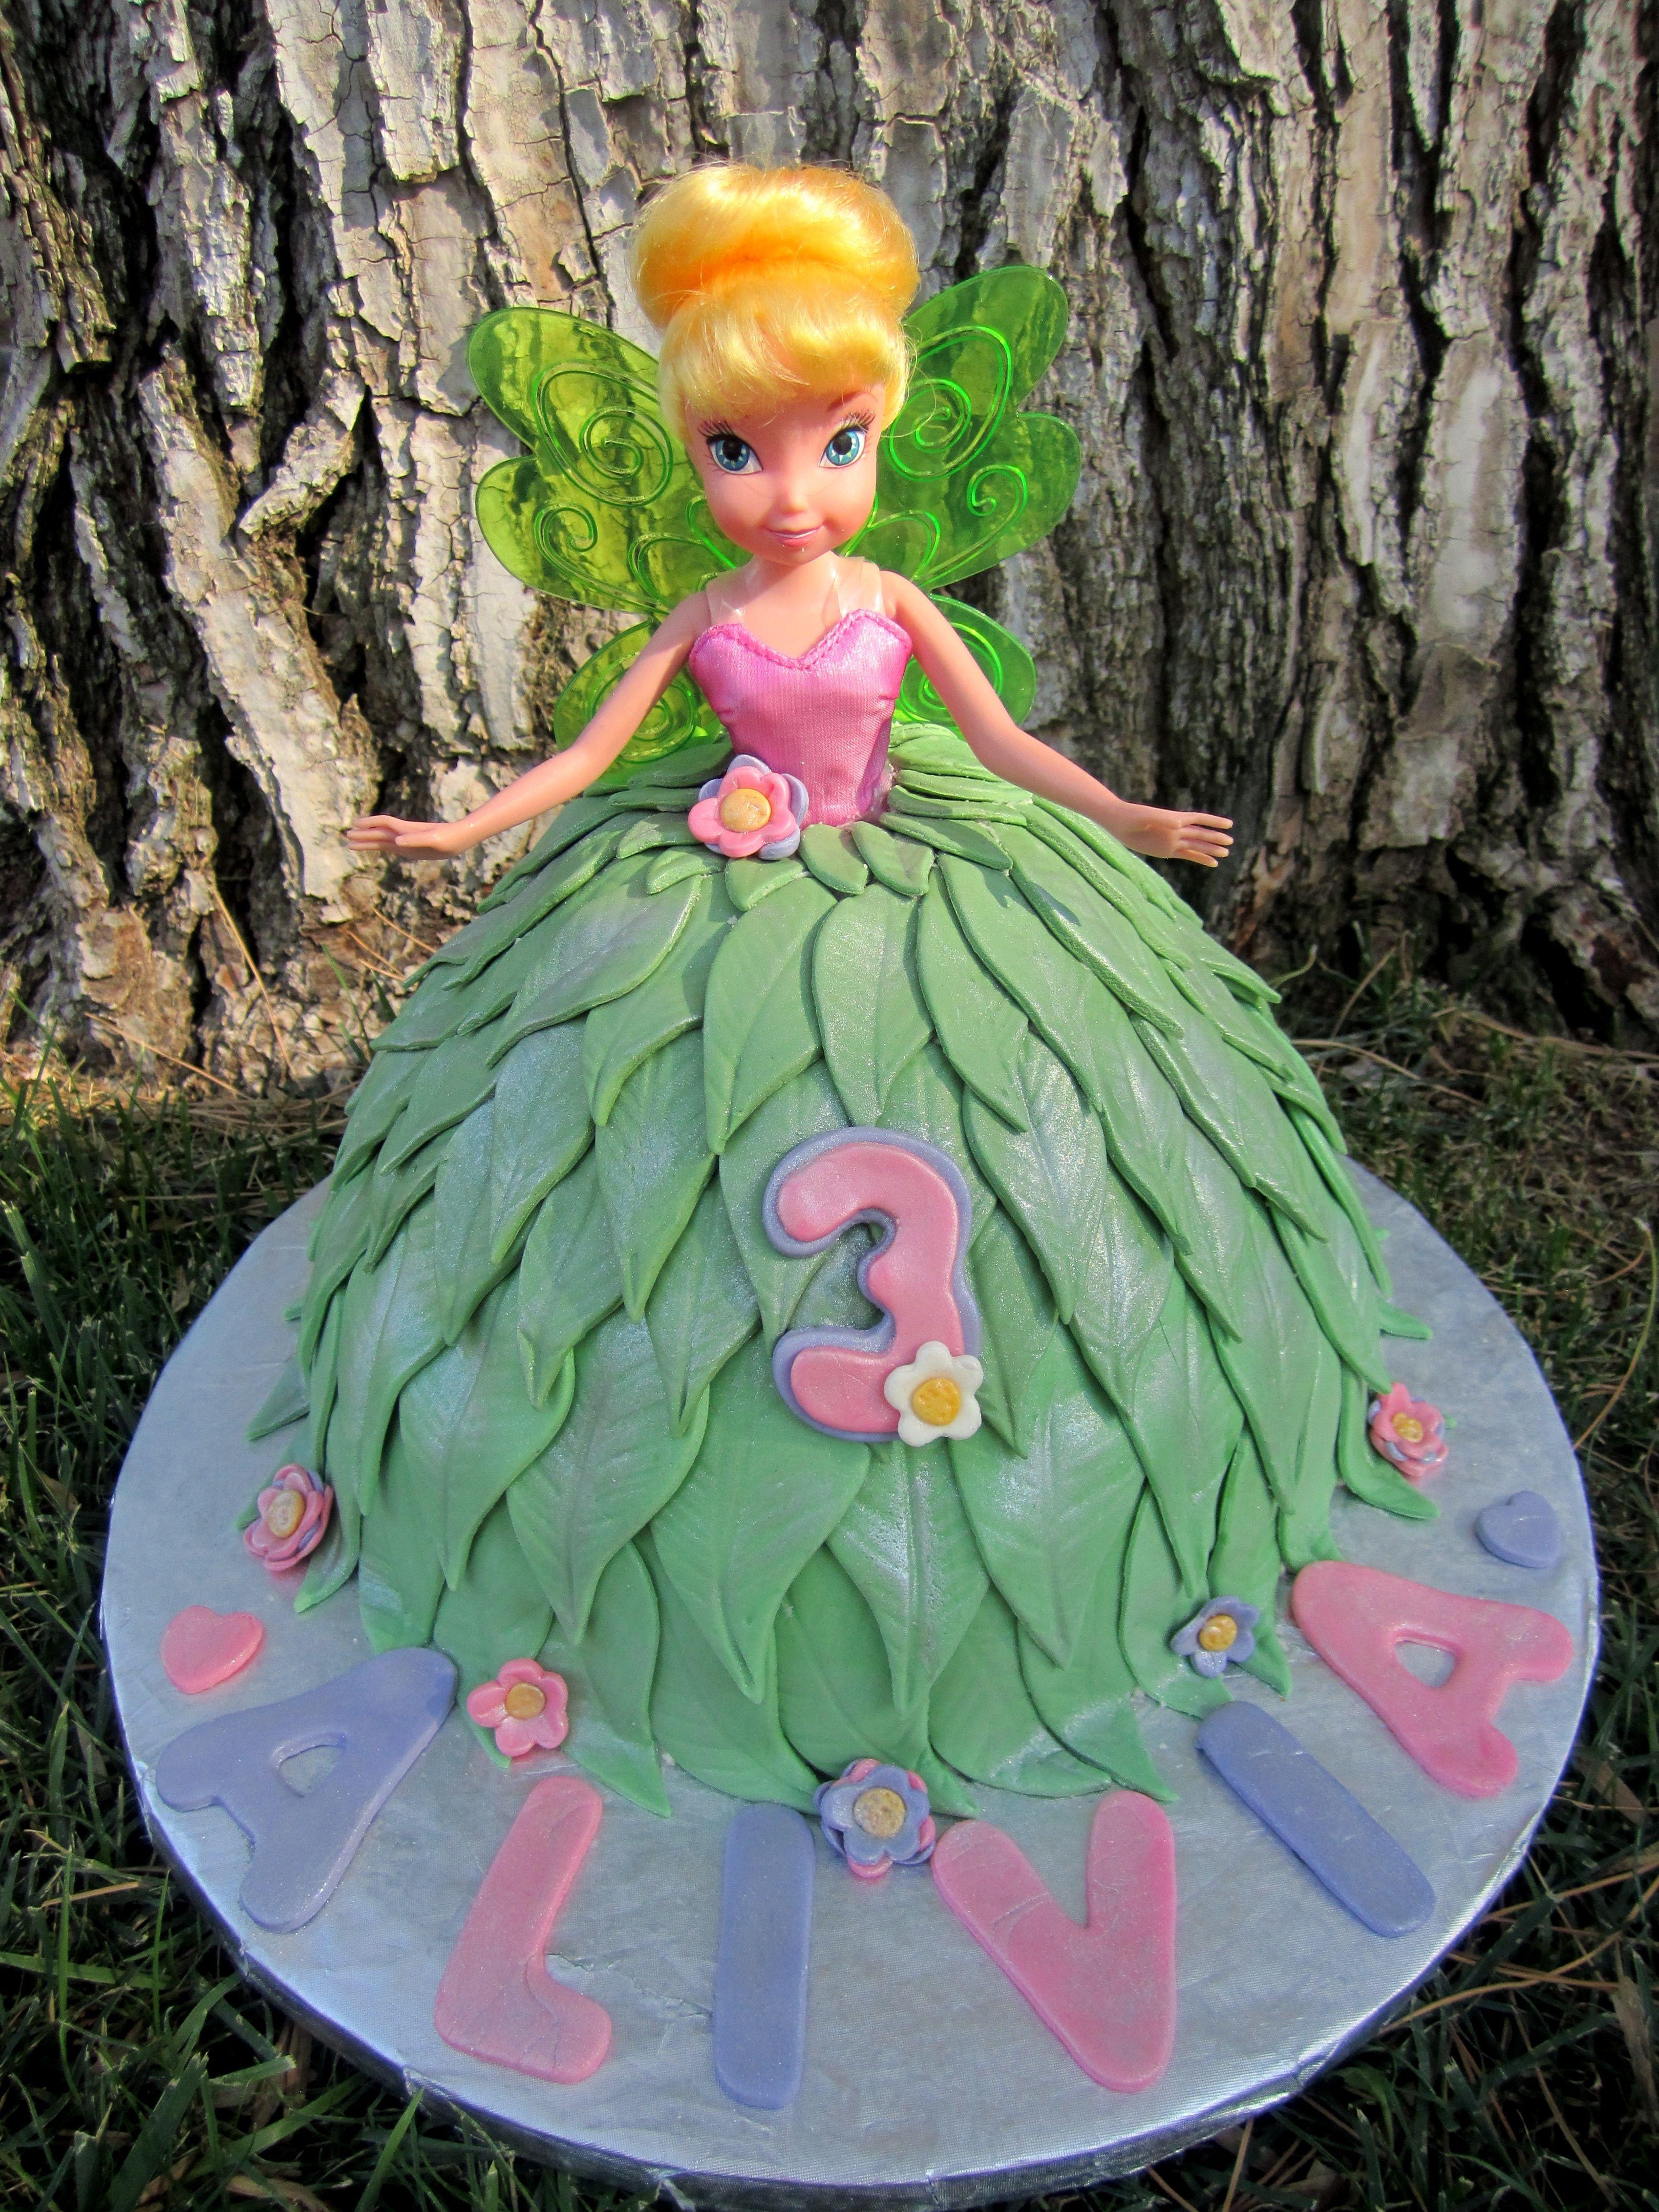 Tinkerbell Doll Cake | Doll cake, Tinkerbell doll, Barbie ...